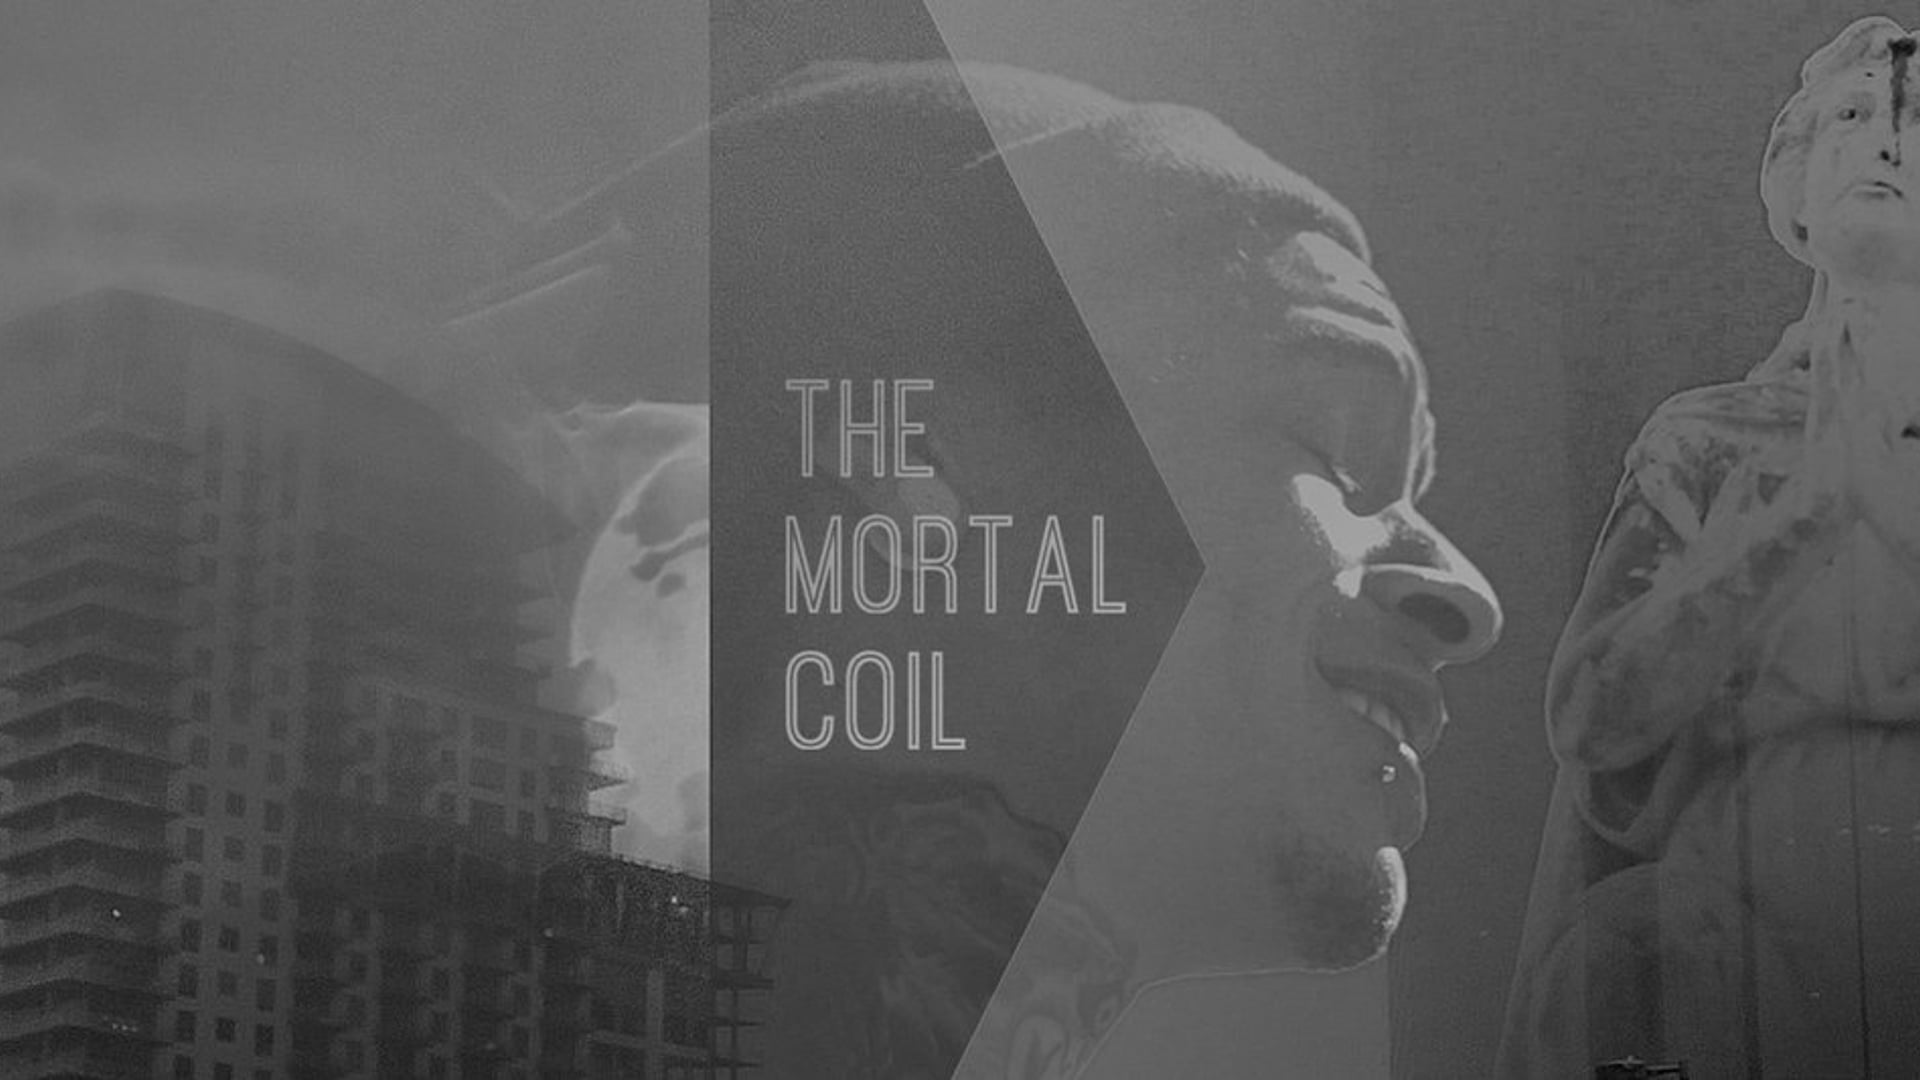 Evan Castle - The Mortal Coil [Official Music Video]